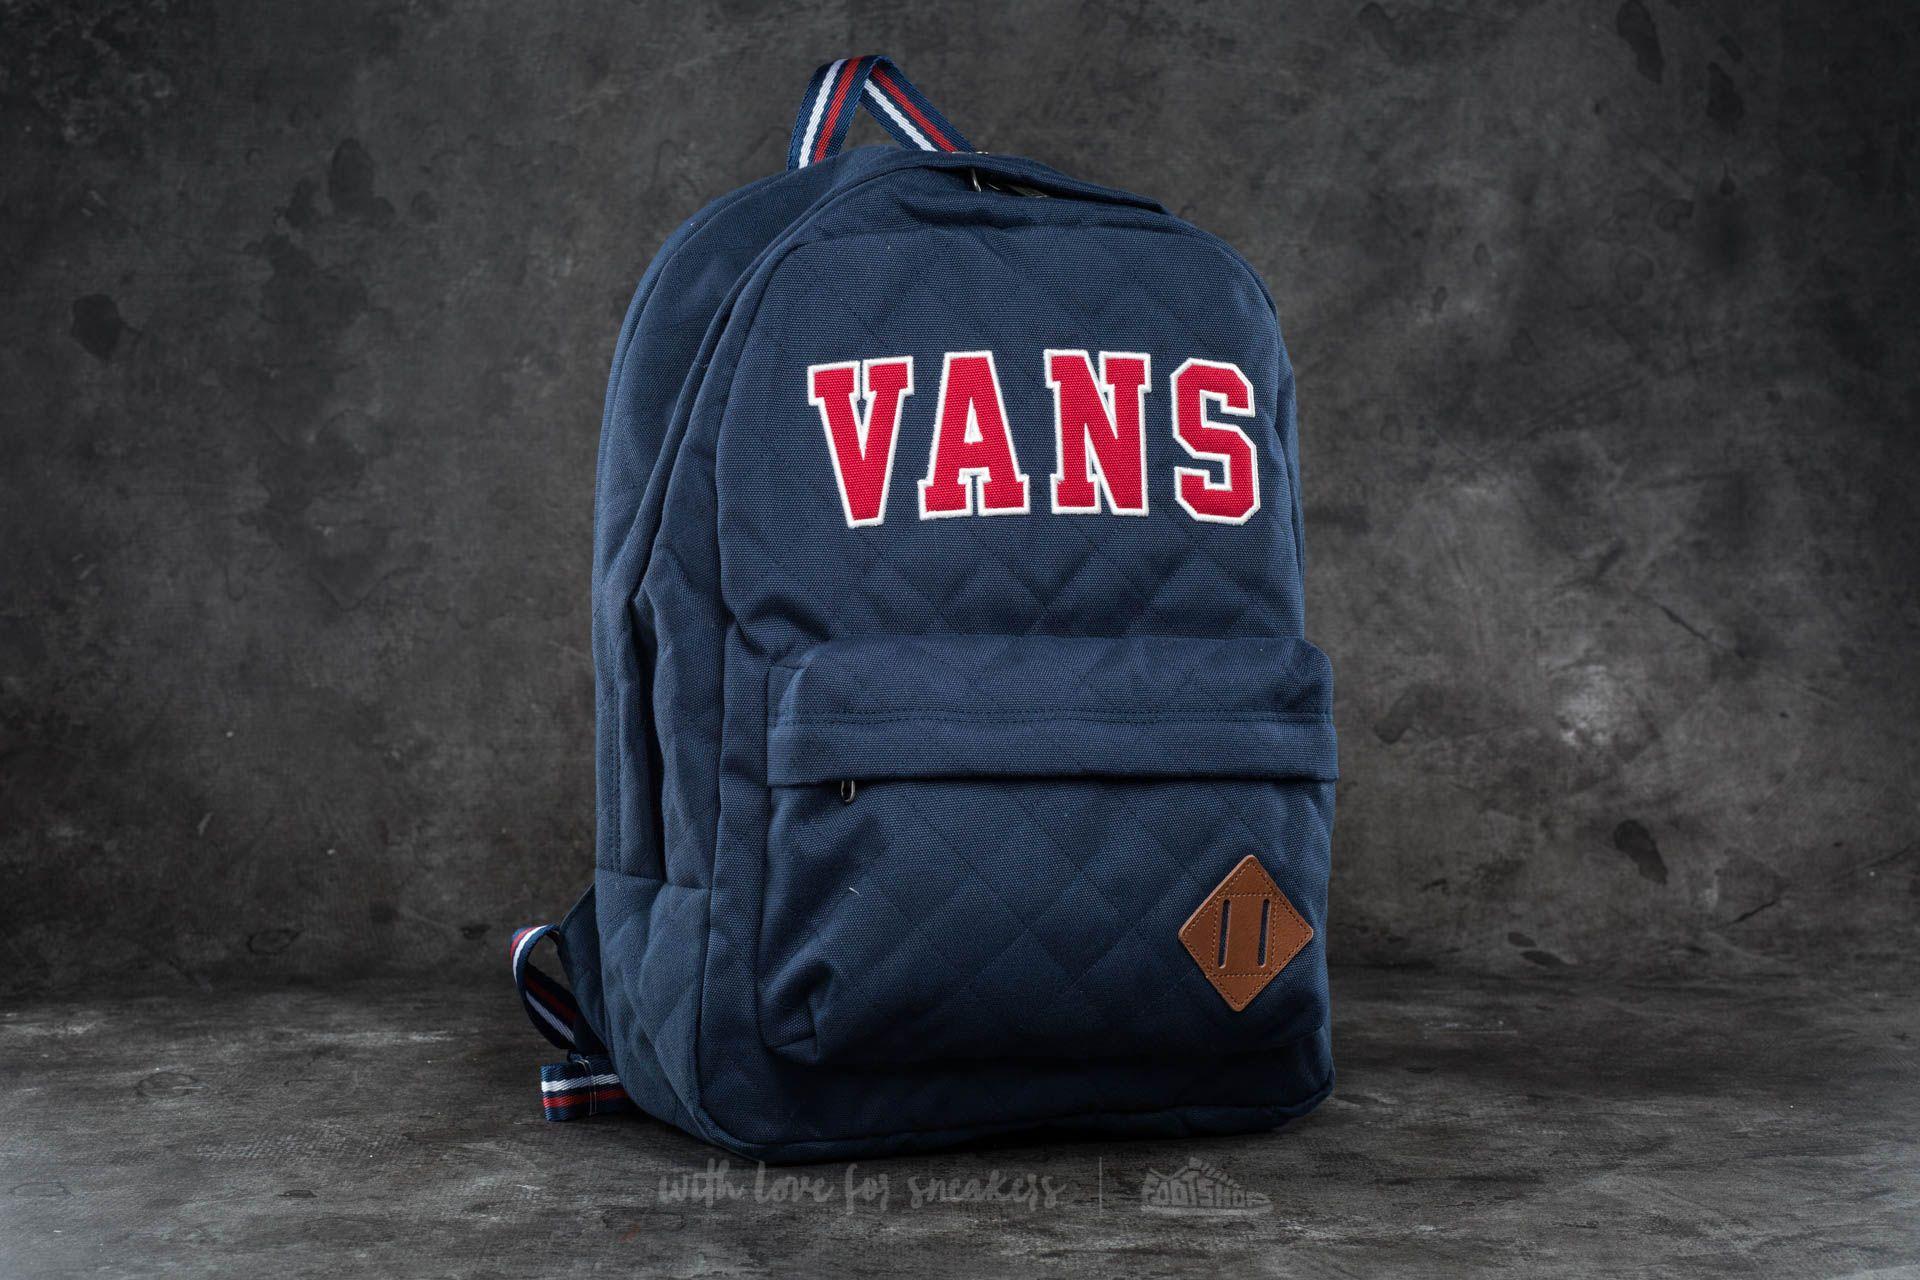 Vans Old Skool Plus Backpack Dress Blues  Chili Pepper  257790836